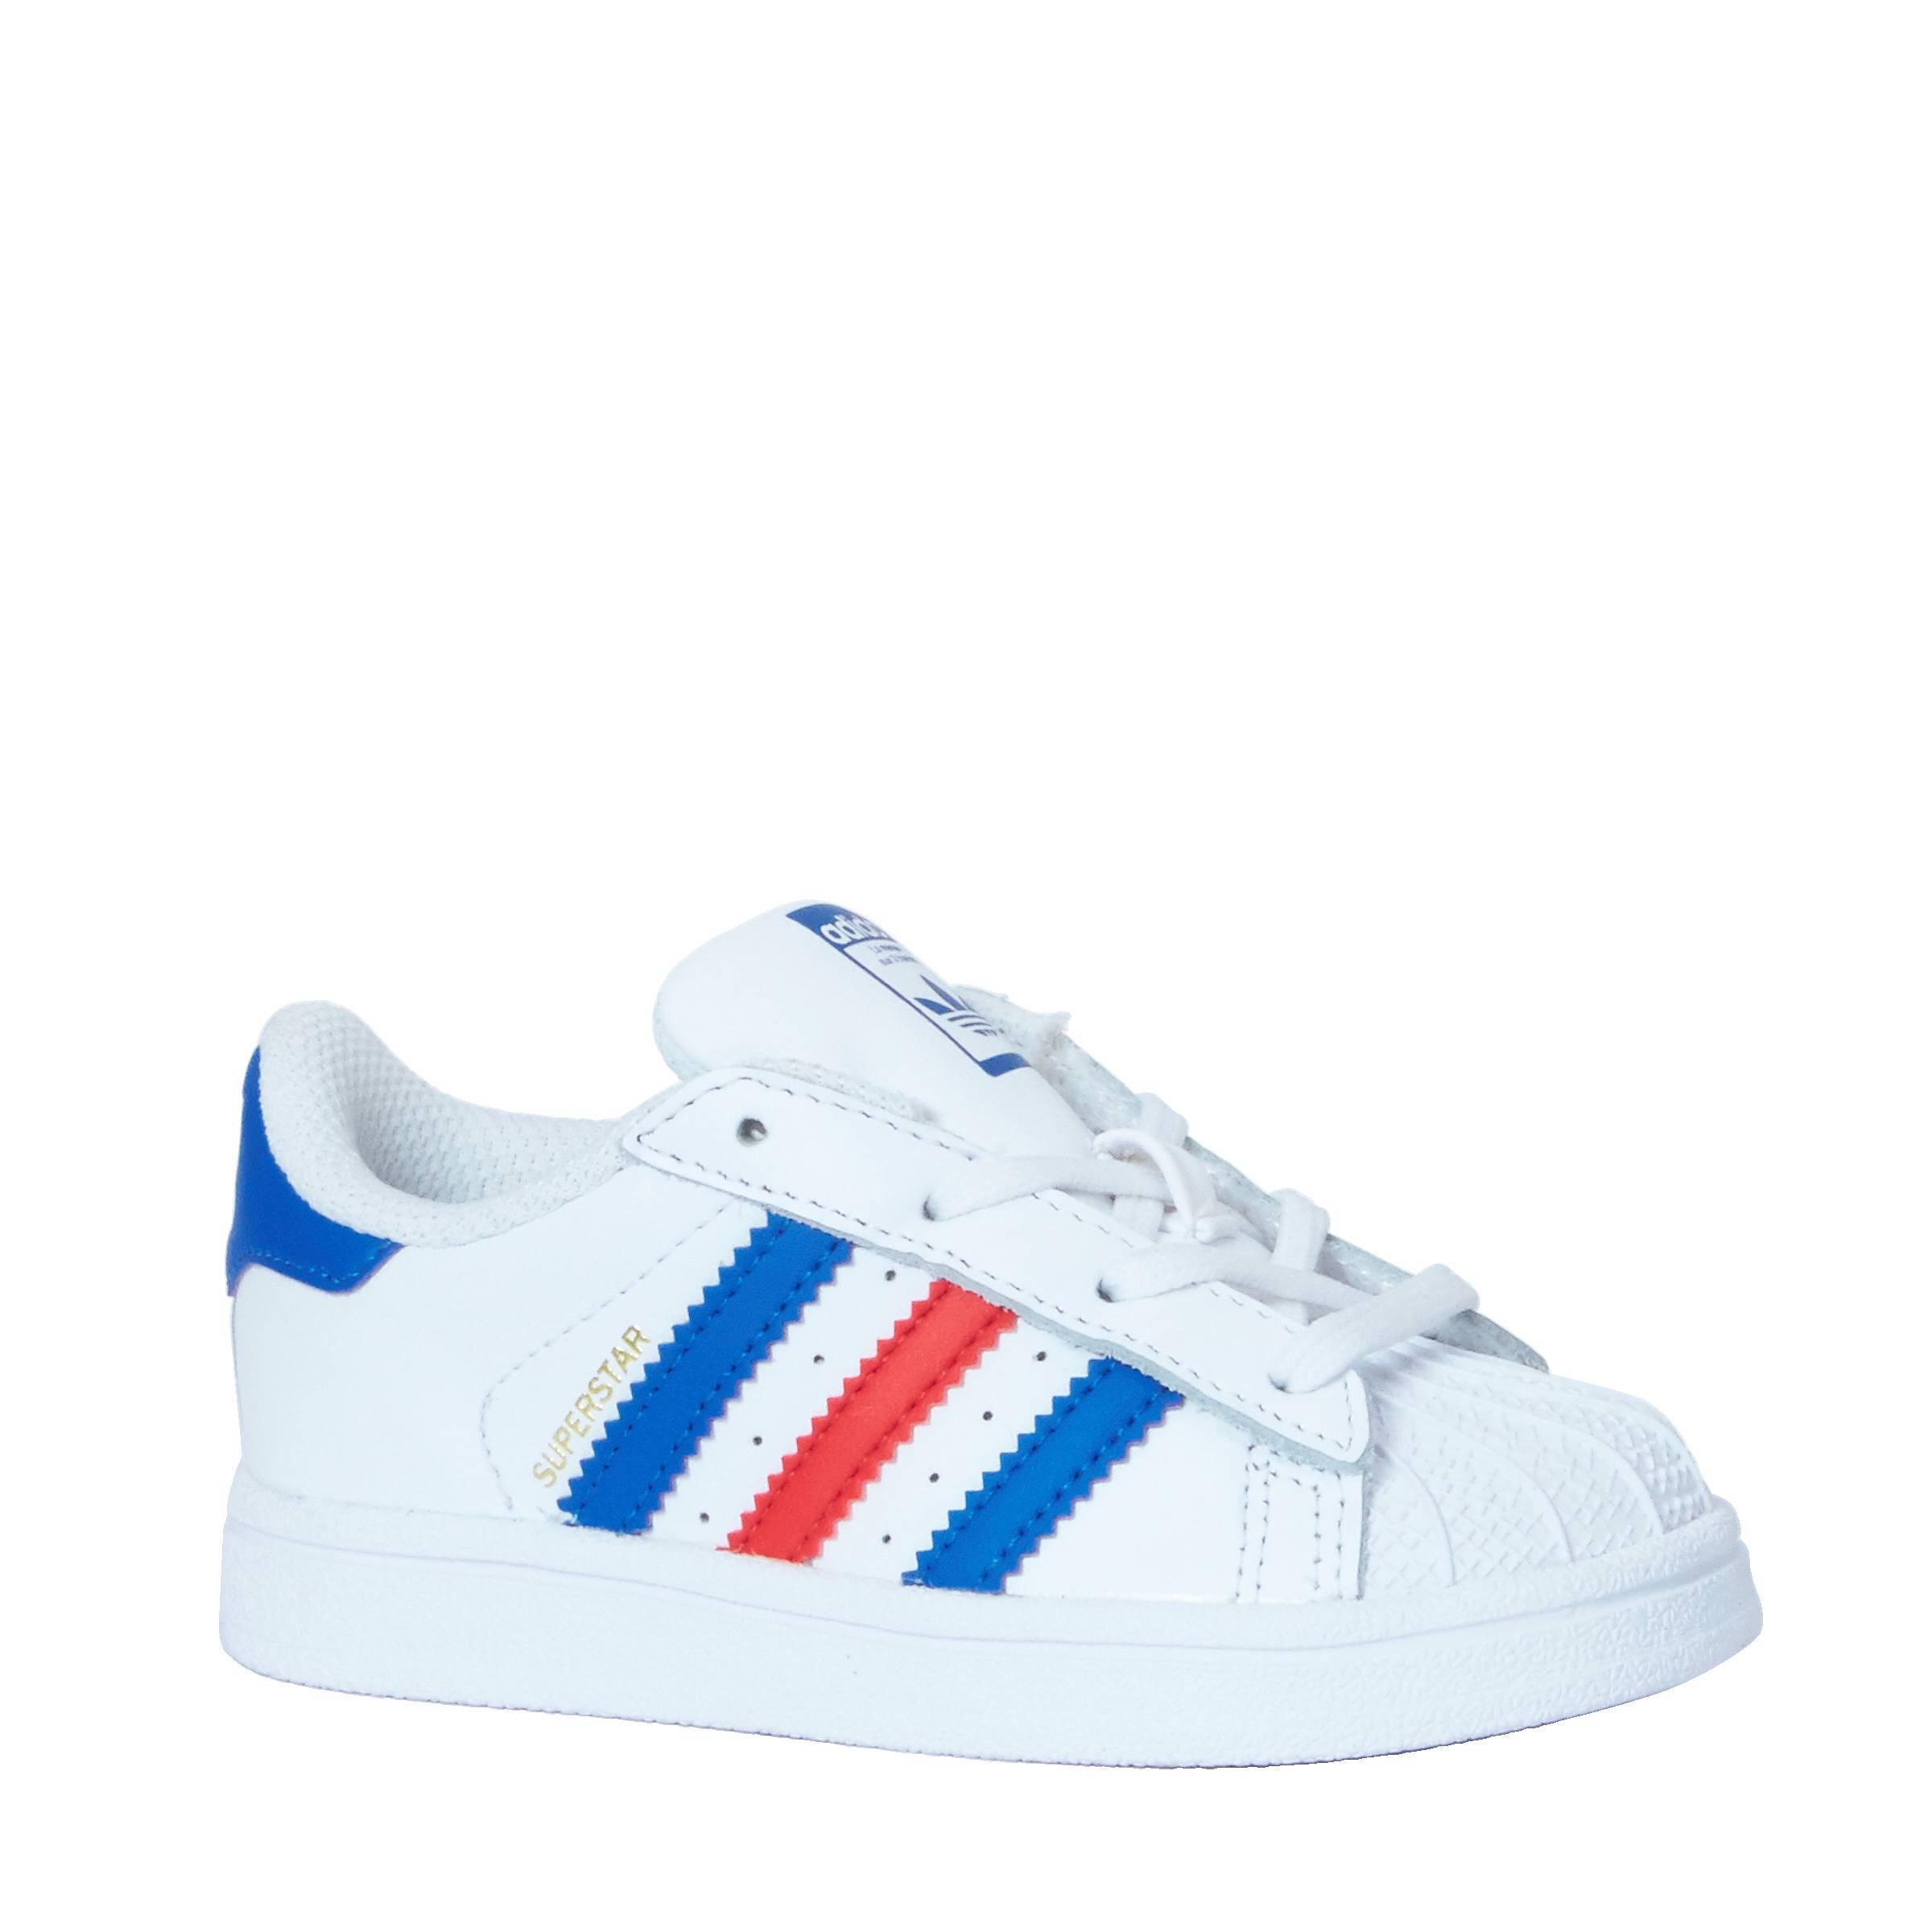 adidas originals rood wit blauw